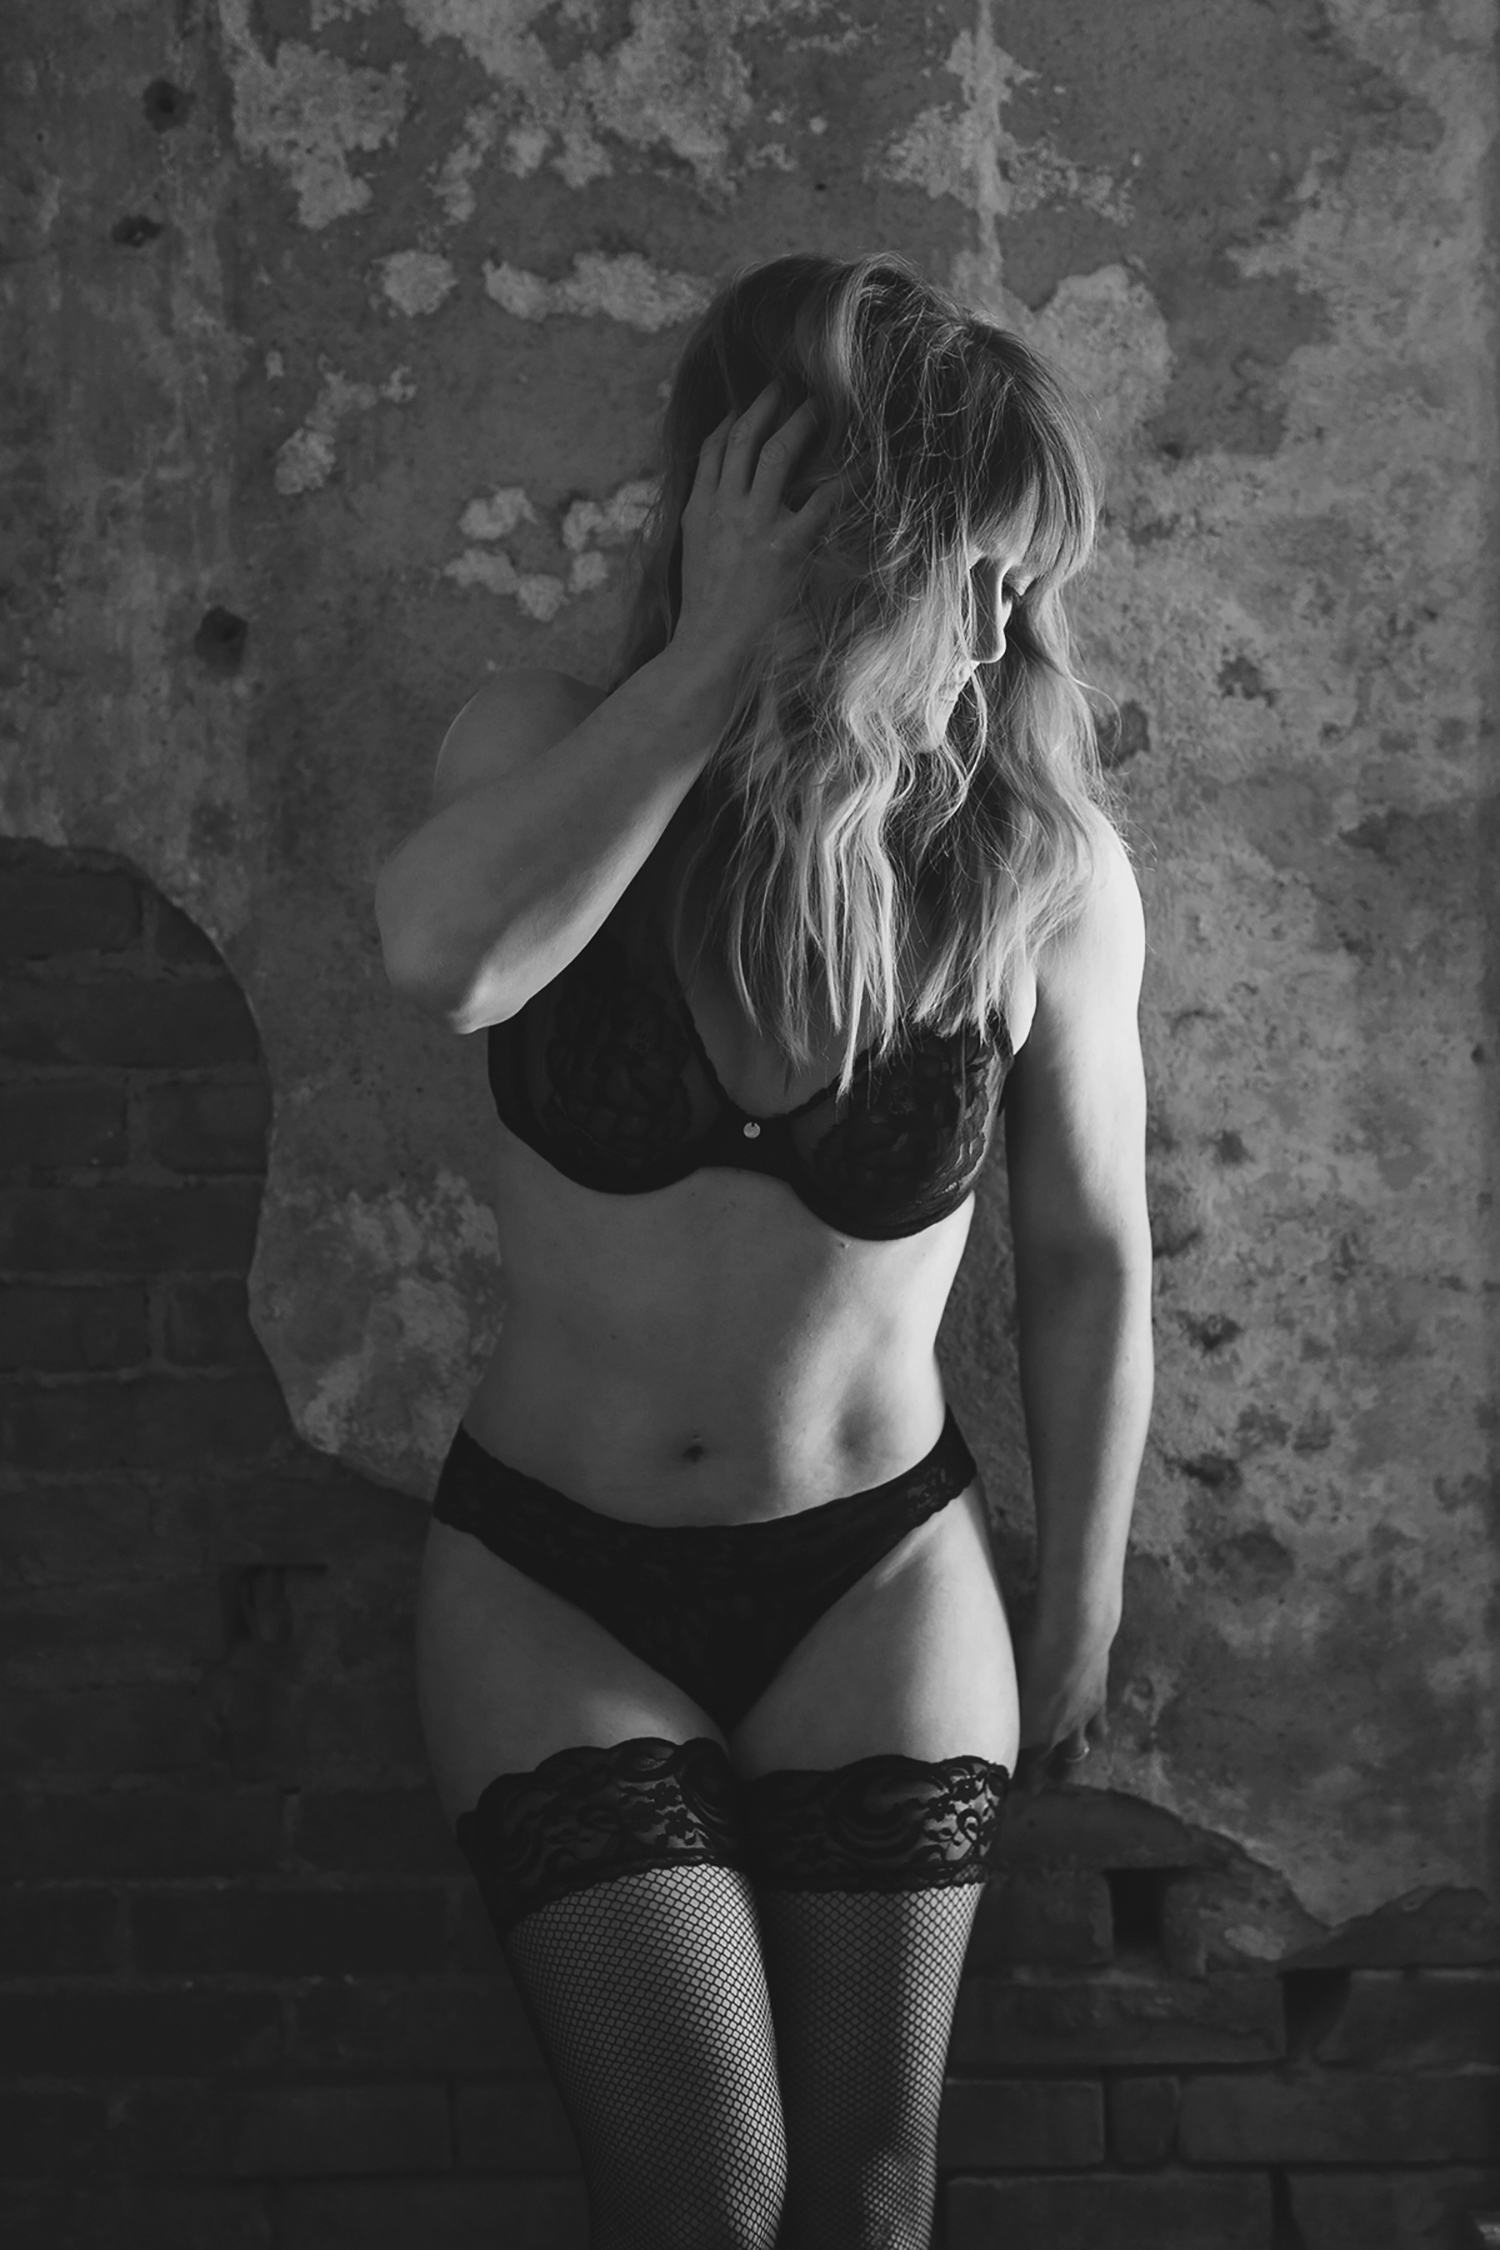 austin-atx-boudoir-artistic-nudes--kbb18.jpg